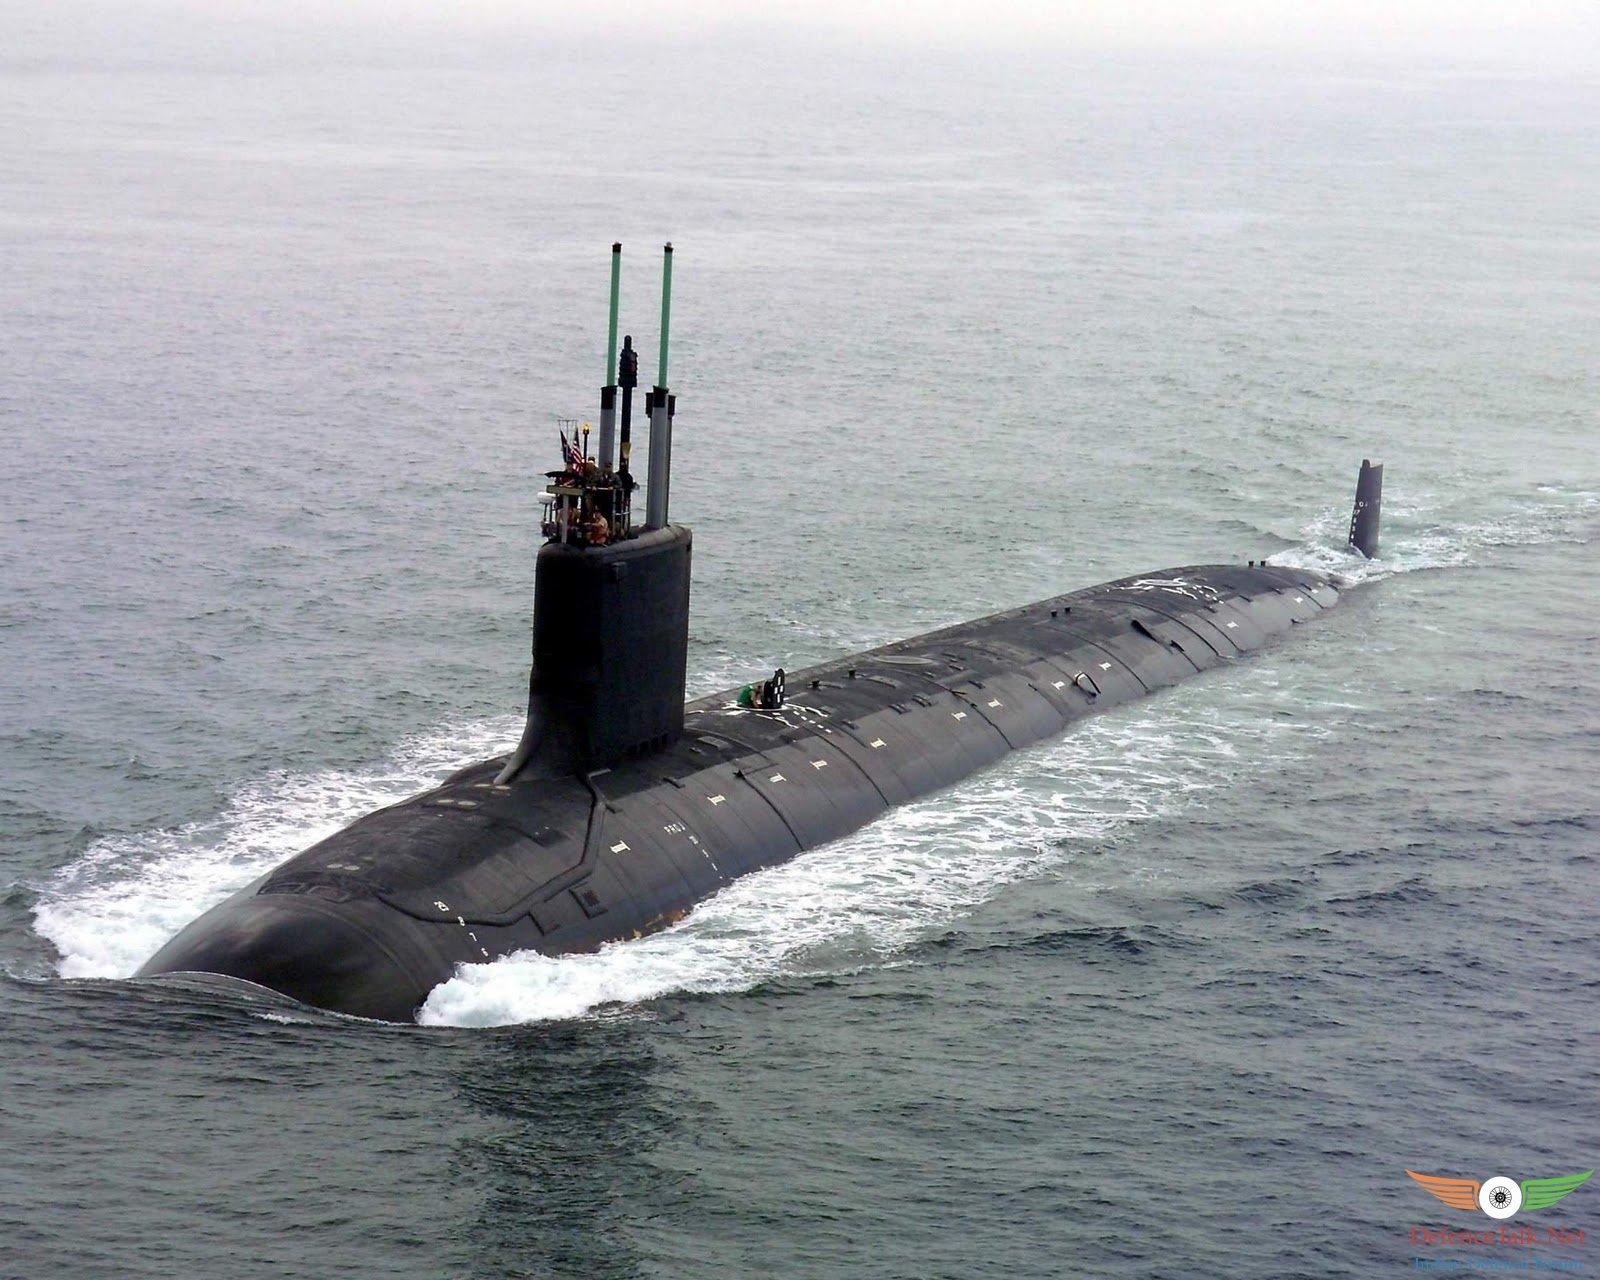 north-korea-fail-submarine-launch-ballistic-missile-slbm-28-11